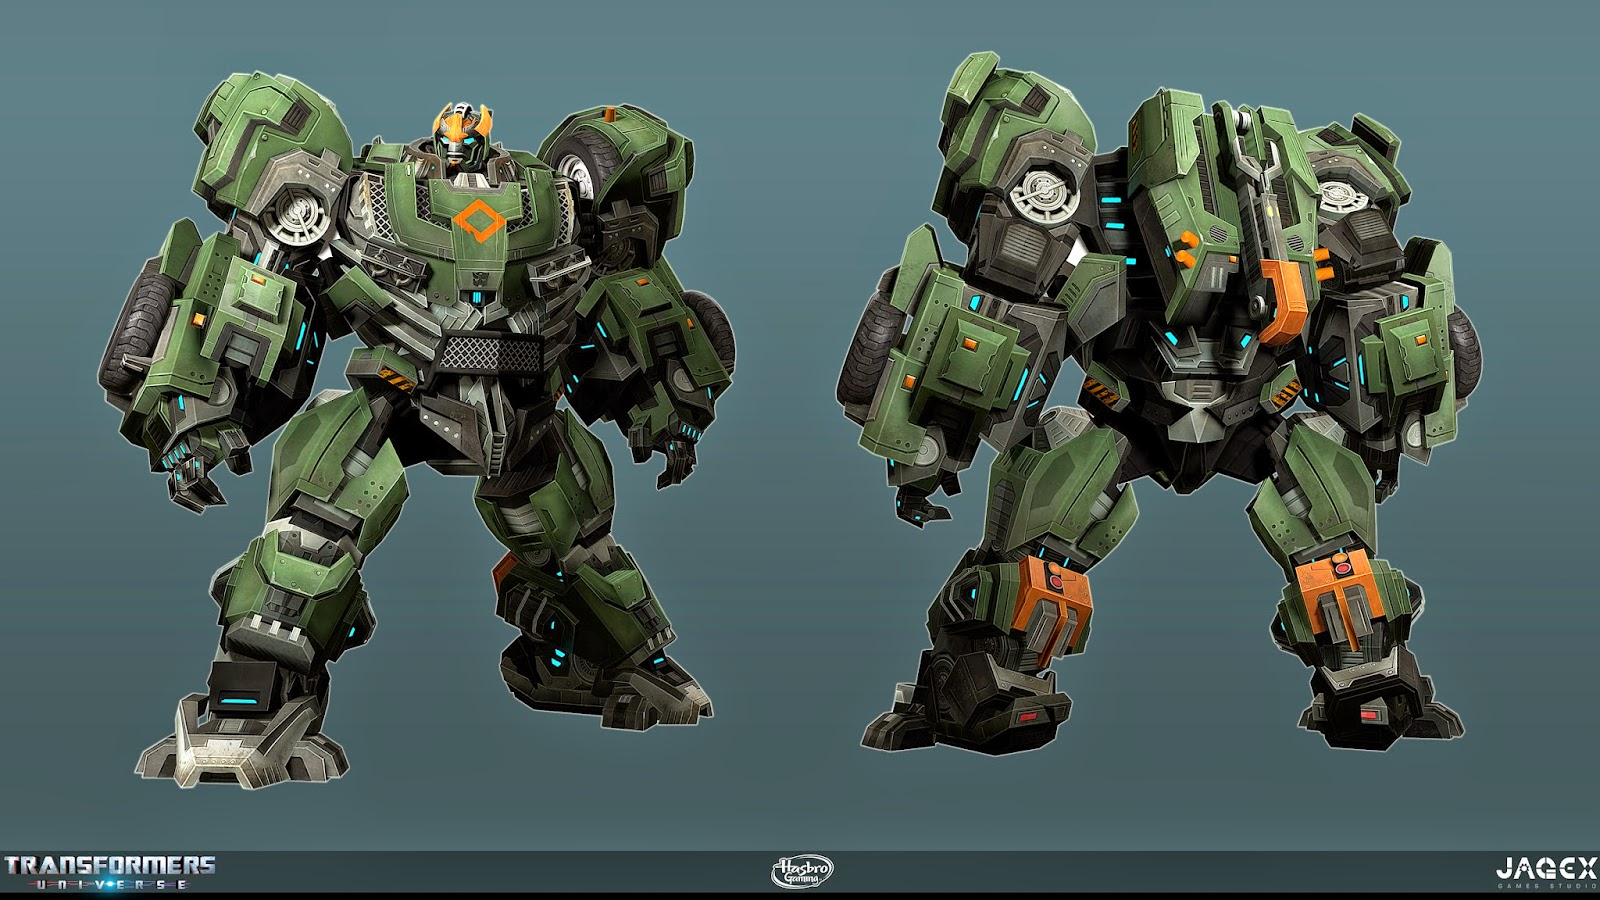 Jagex Transformers Universe Concept Artwork including ...